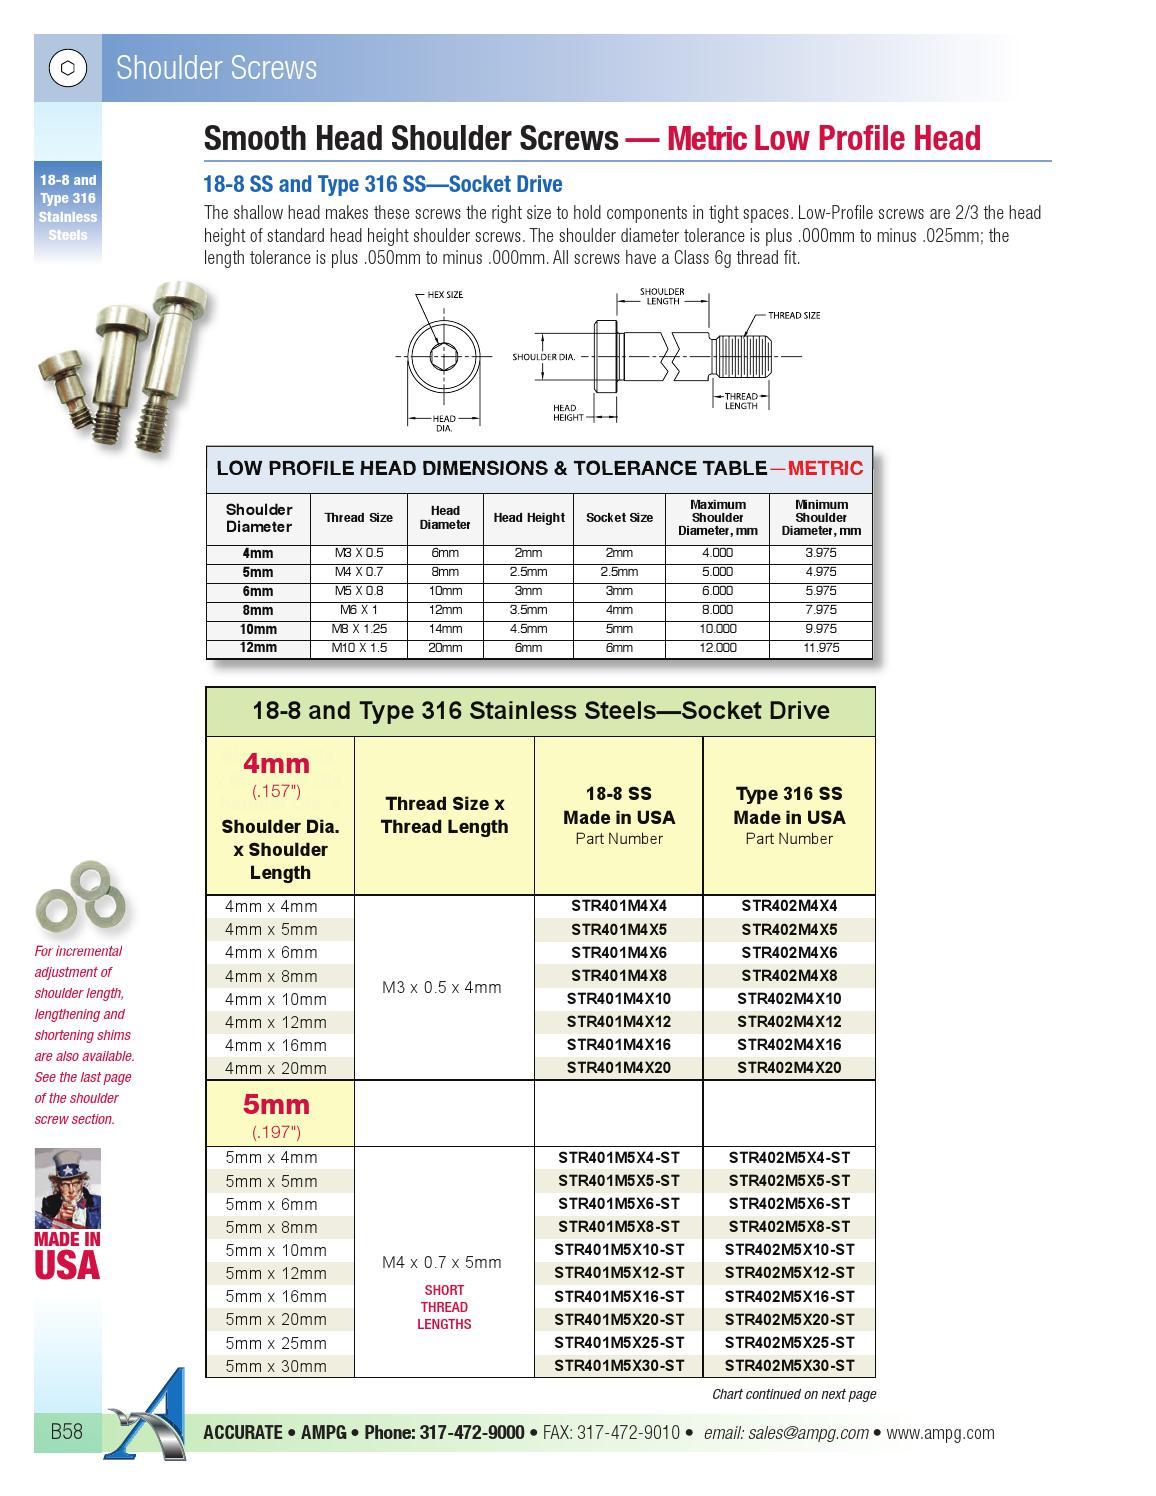 STR60173C26 8-32 x 1 5//8 In L Ampg303 Shoulder Screw